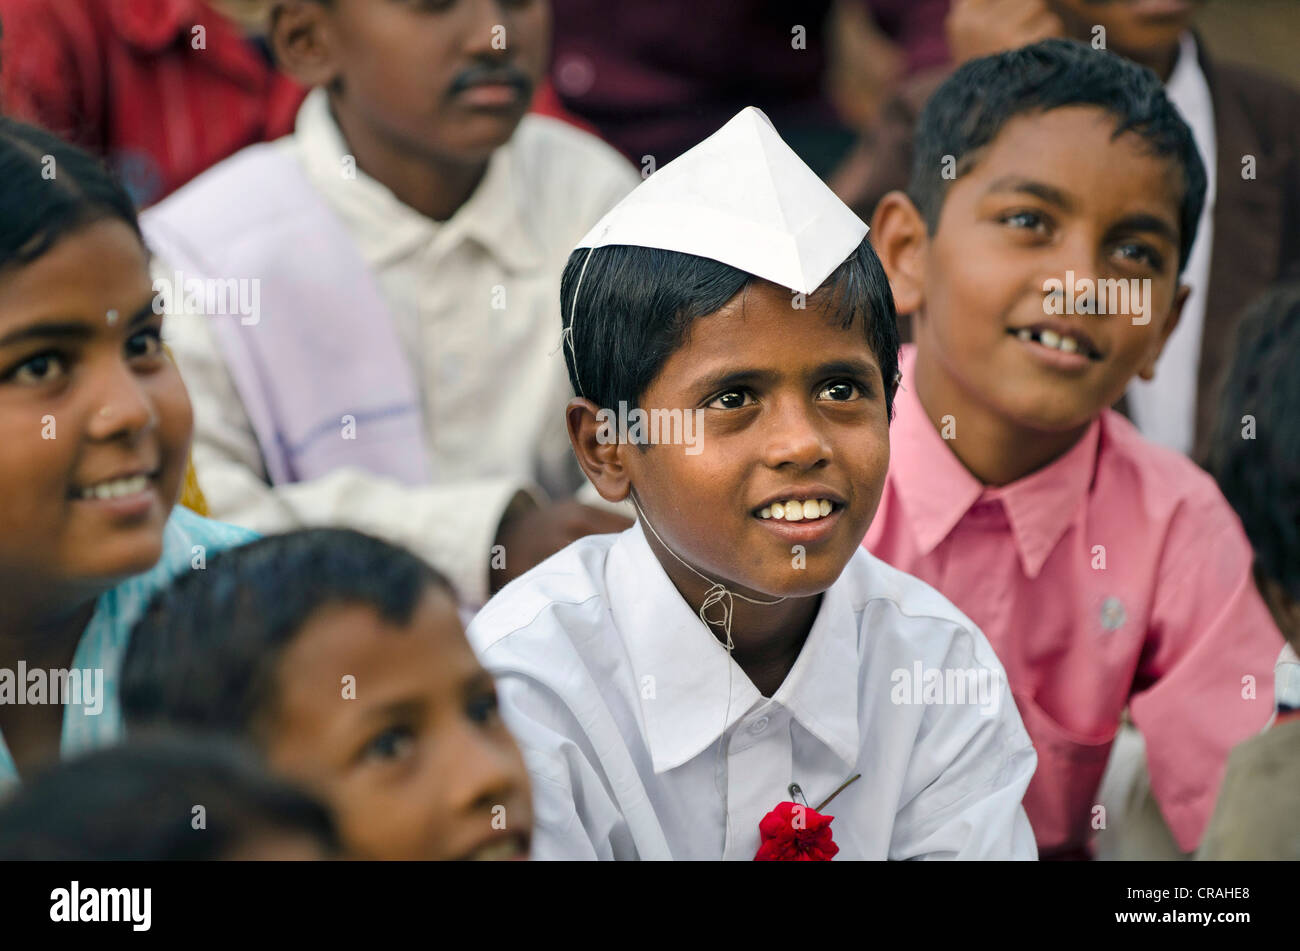 Boy dressed up as Jawaharlal Nehru, demonstration against child labour, Karur, Tamil Nadu, India, Asia - Stock Image